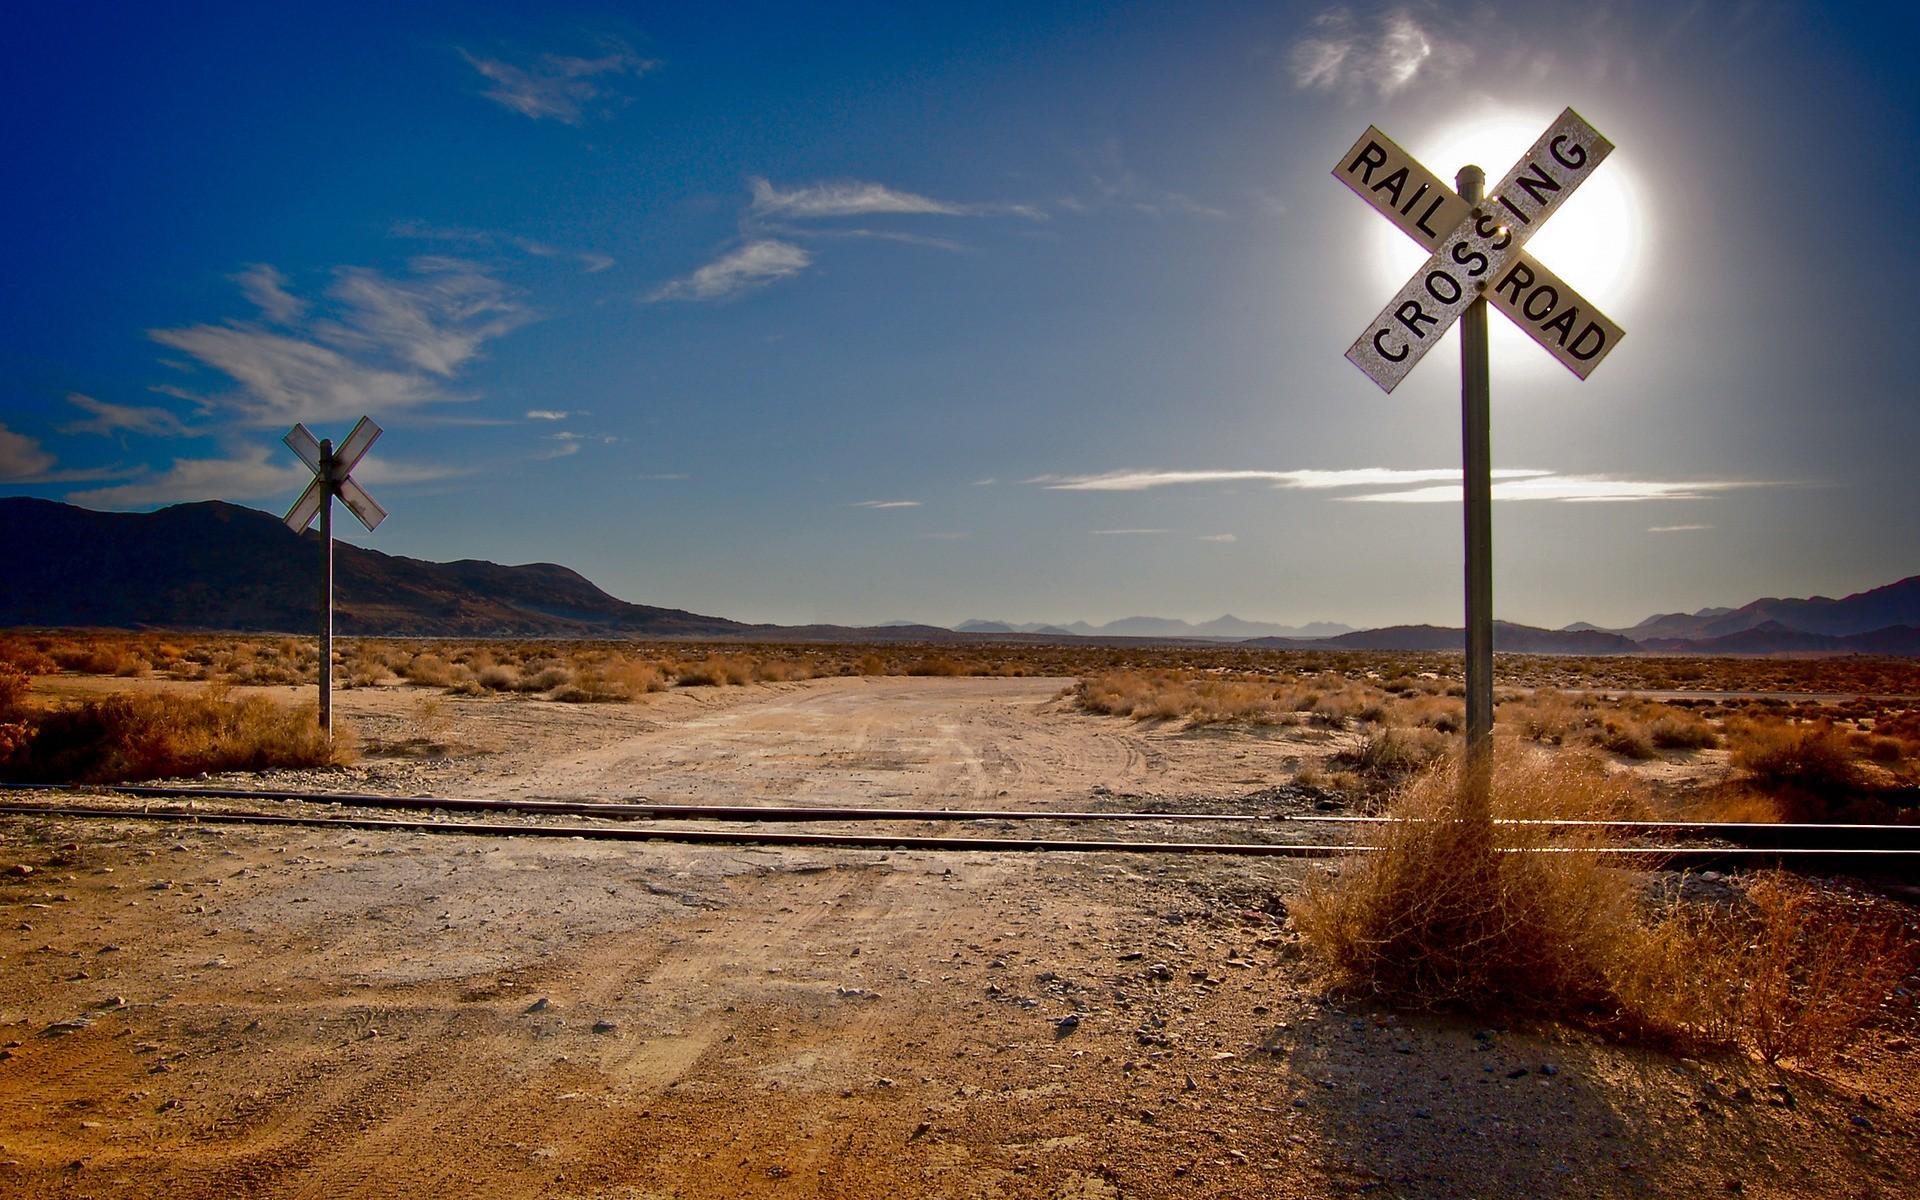 Desert Railroad Wallpaper